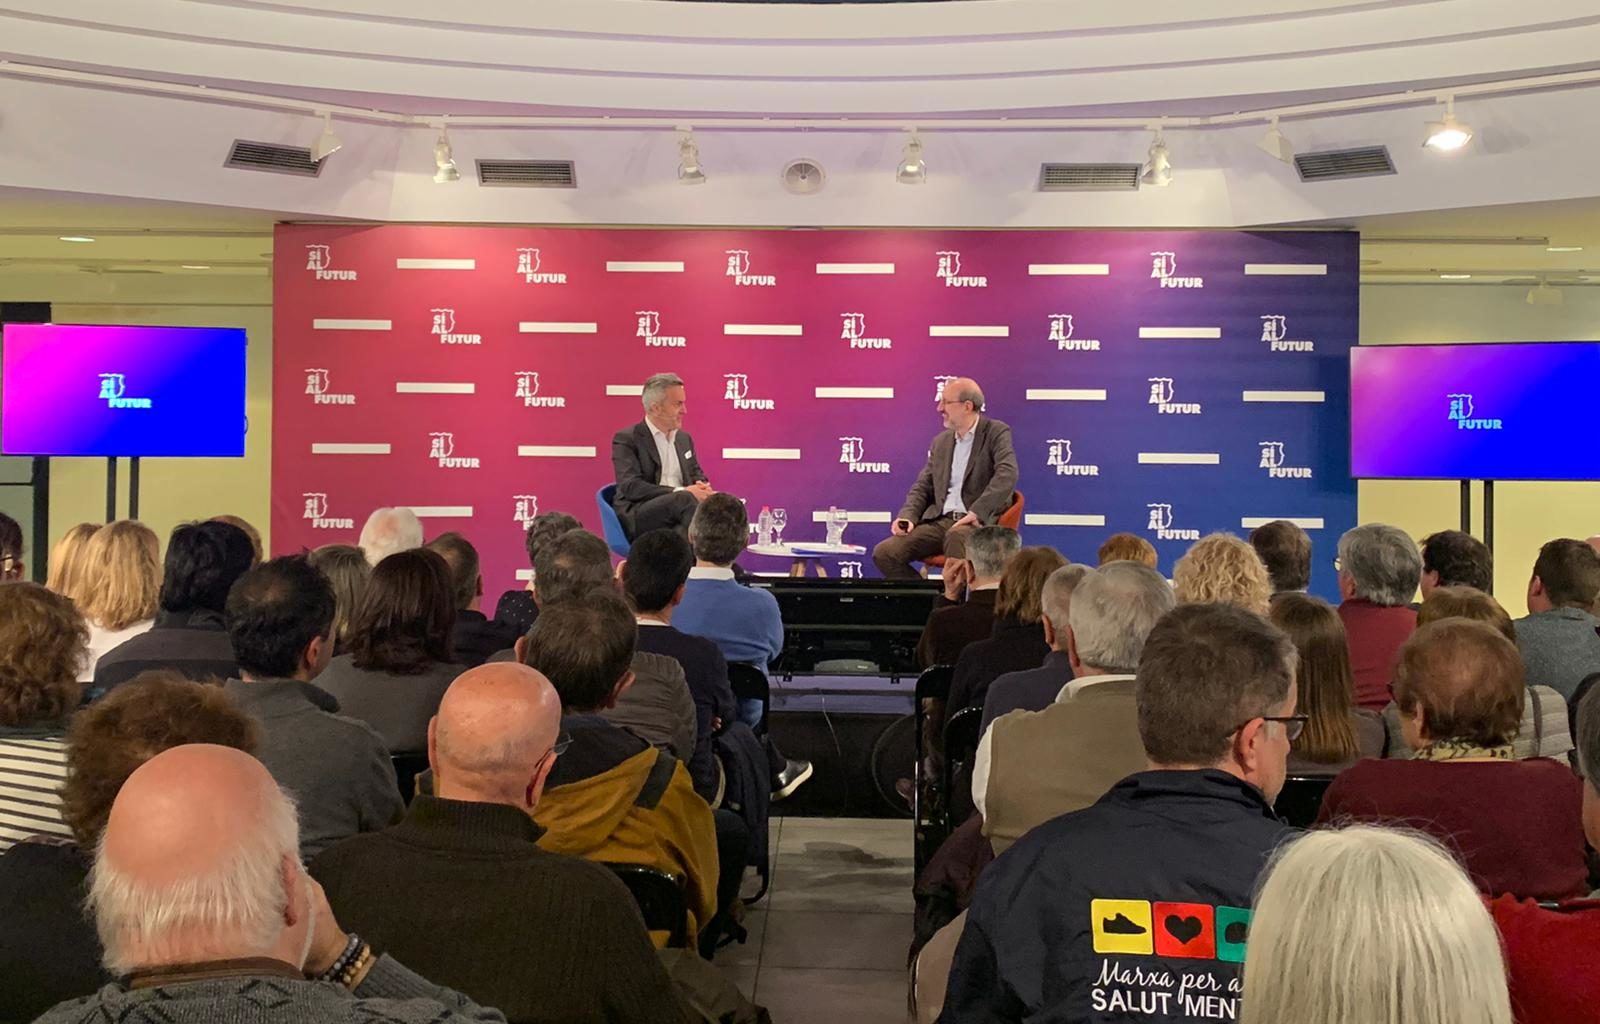 Sí al futur will be presented on Saturday 28 March, at the Barça Fan Club Els Tamarells, in Felanitx, Mallorca